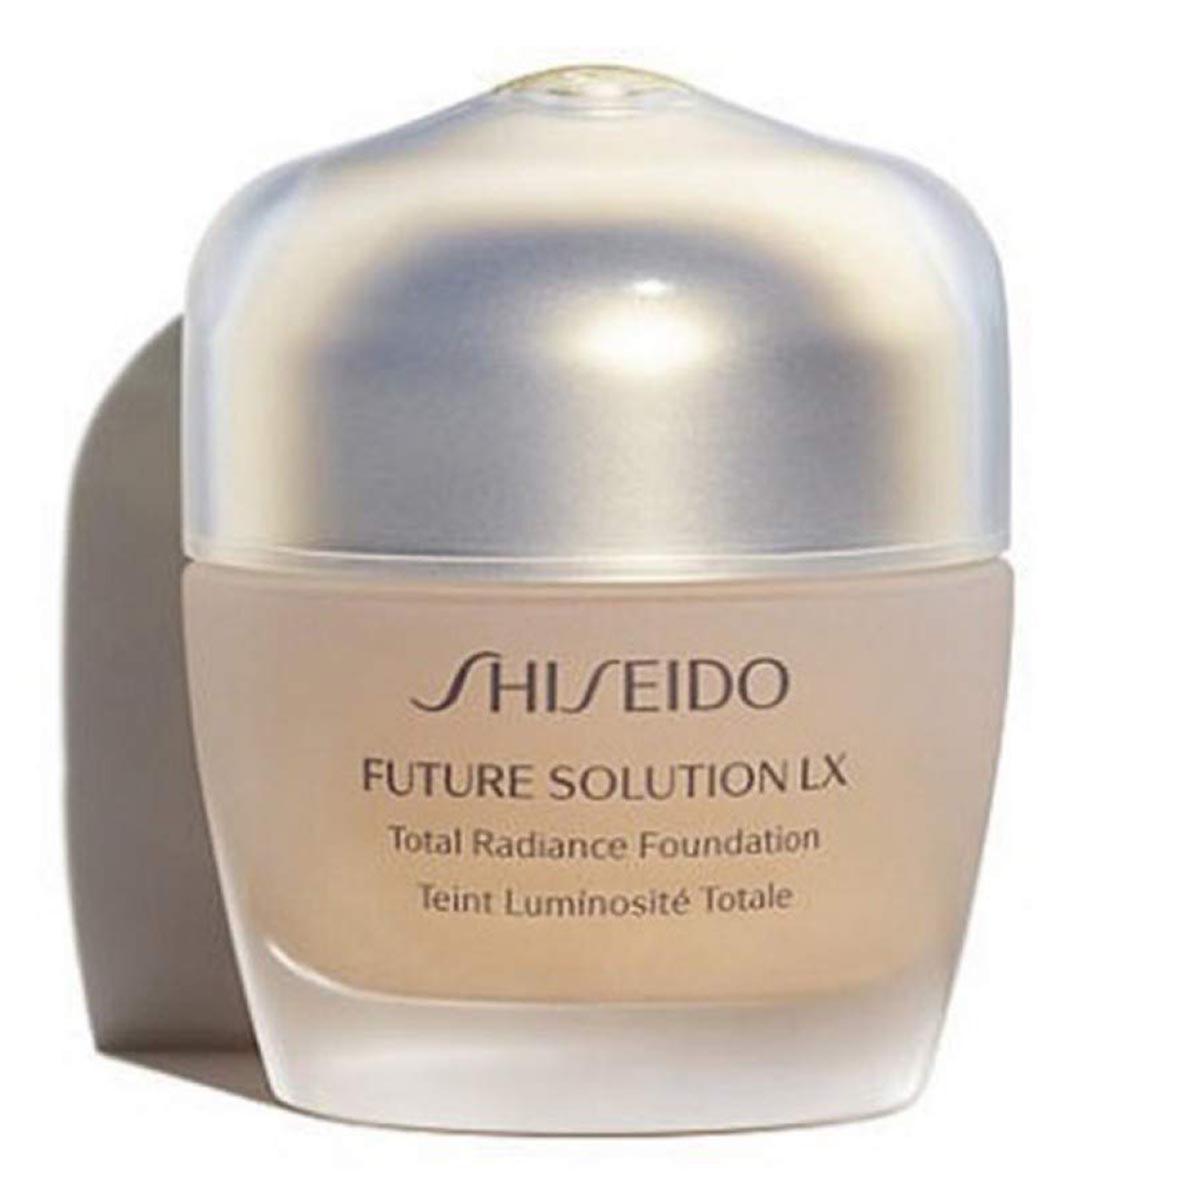 Shiseido future solution lx total radiance foundation r4 rose